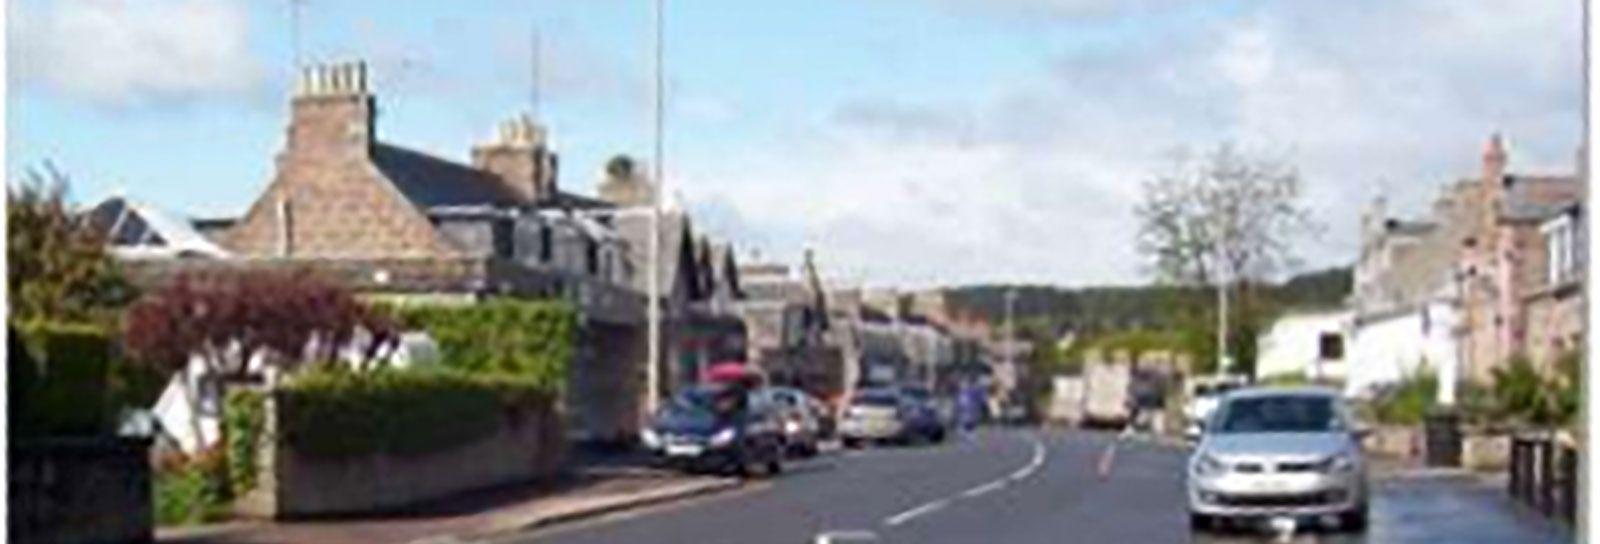 Peterculter in Aberdeen banner image